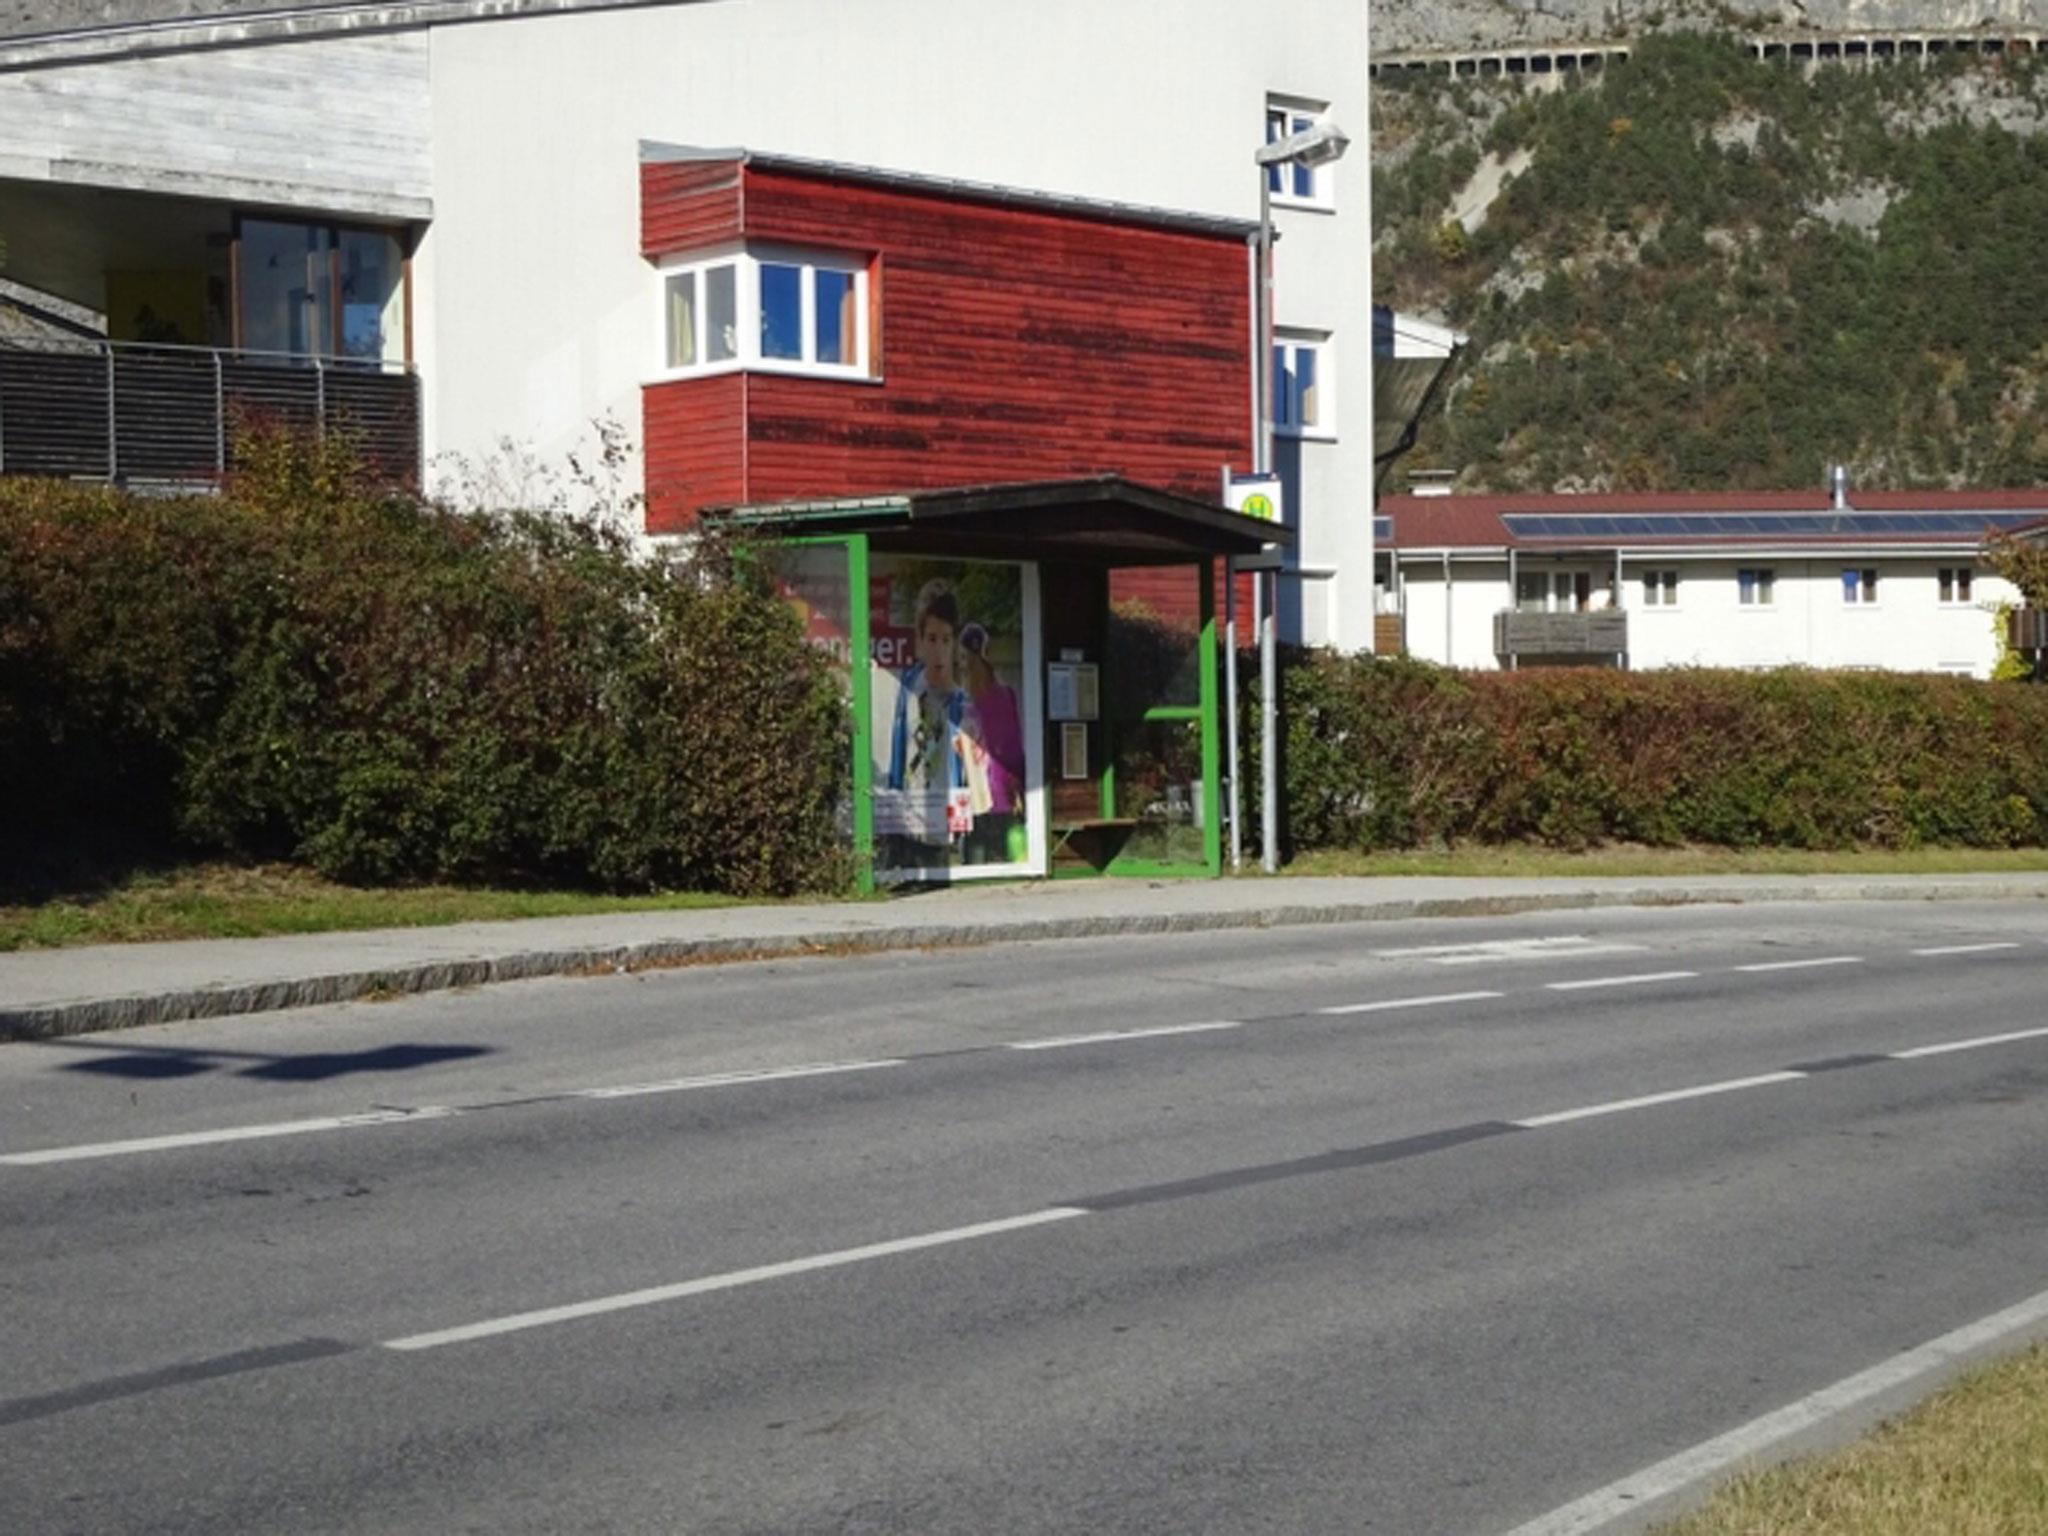 Haltestelle Kematen Neue Heimat Innsbruck Info